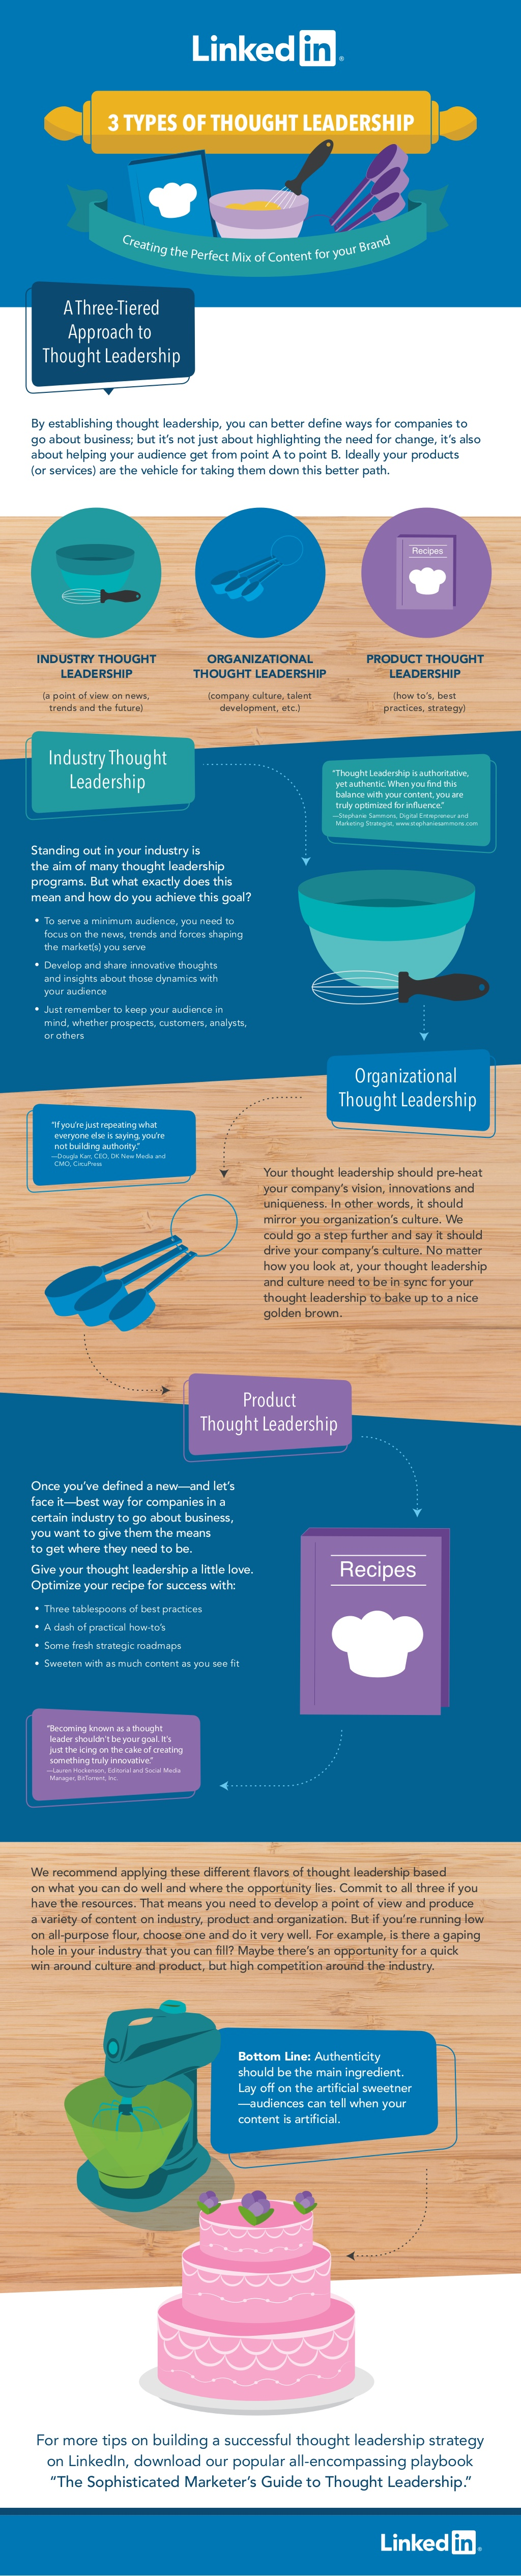 Thought leadership på LinkedIn